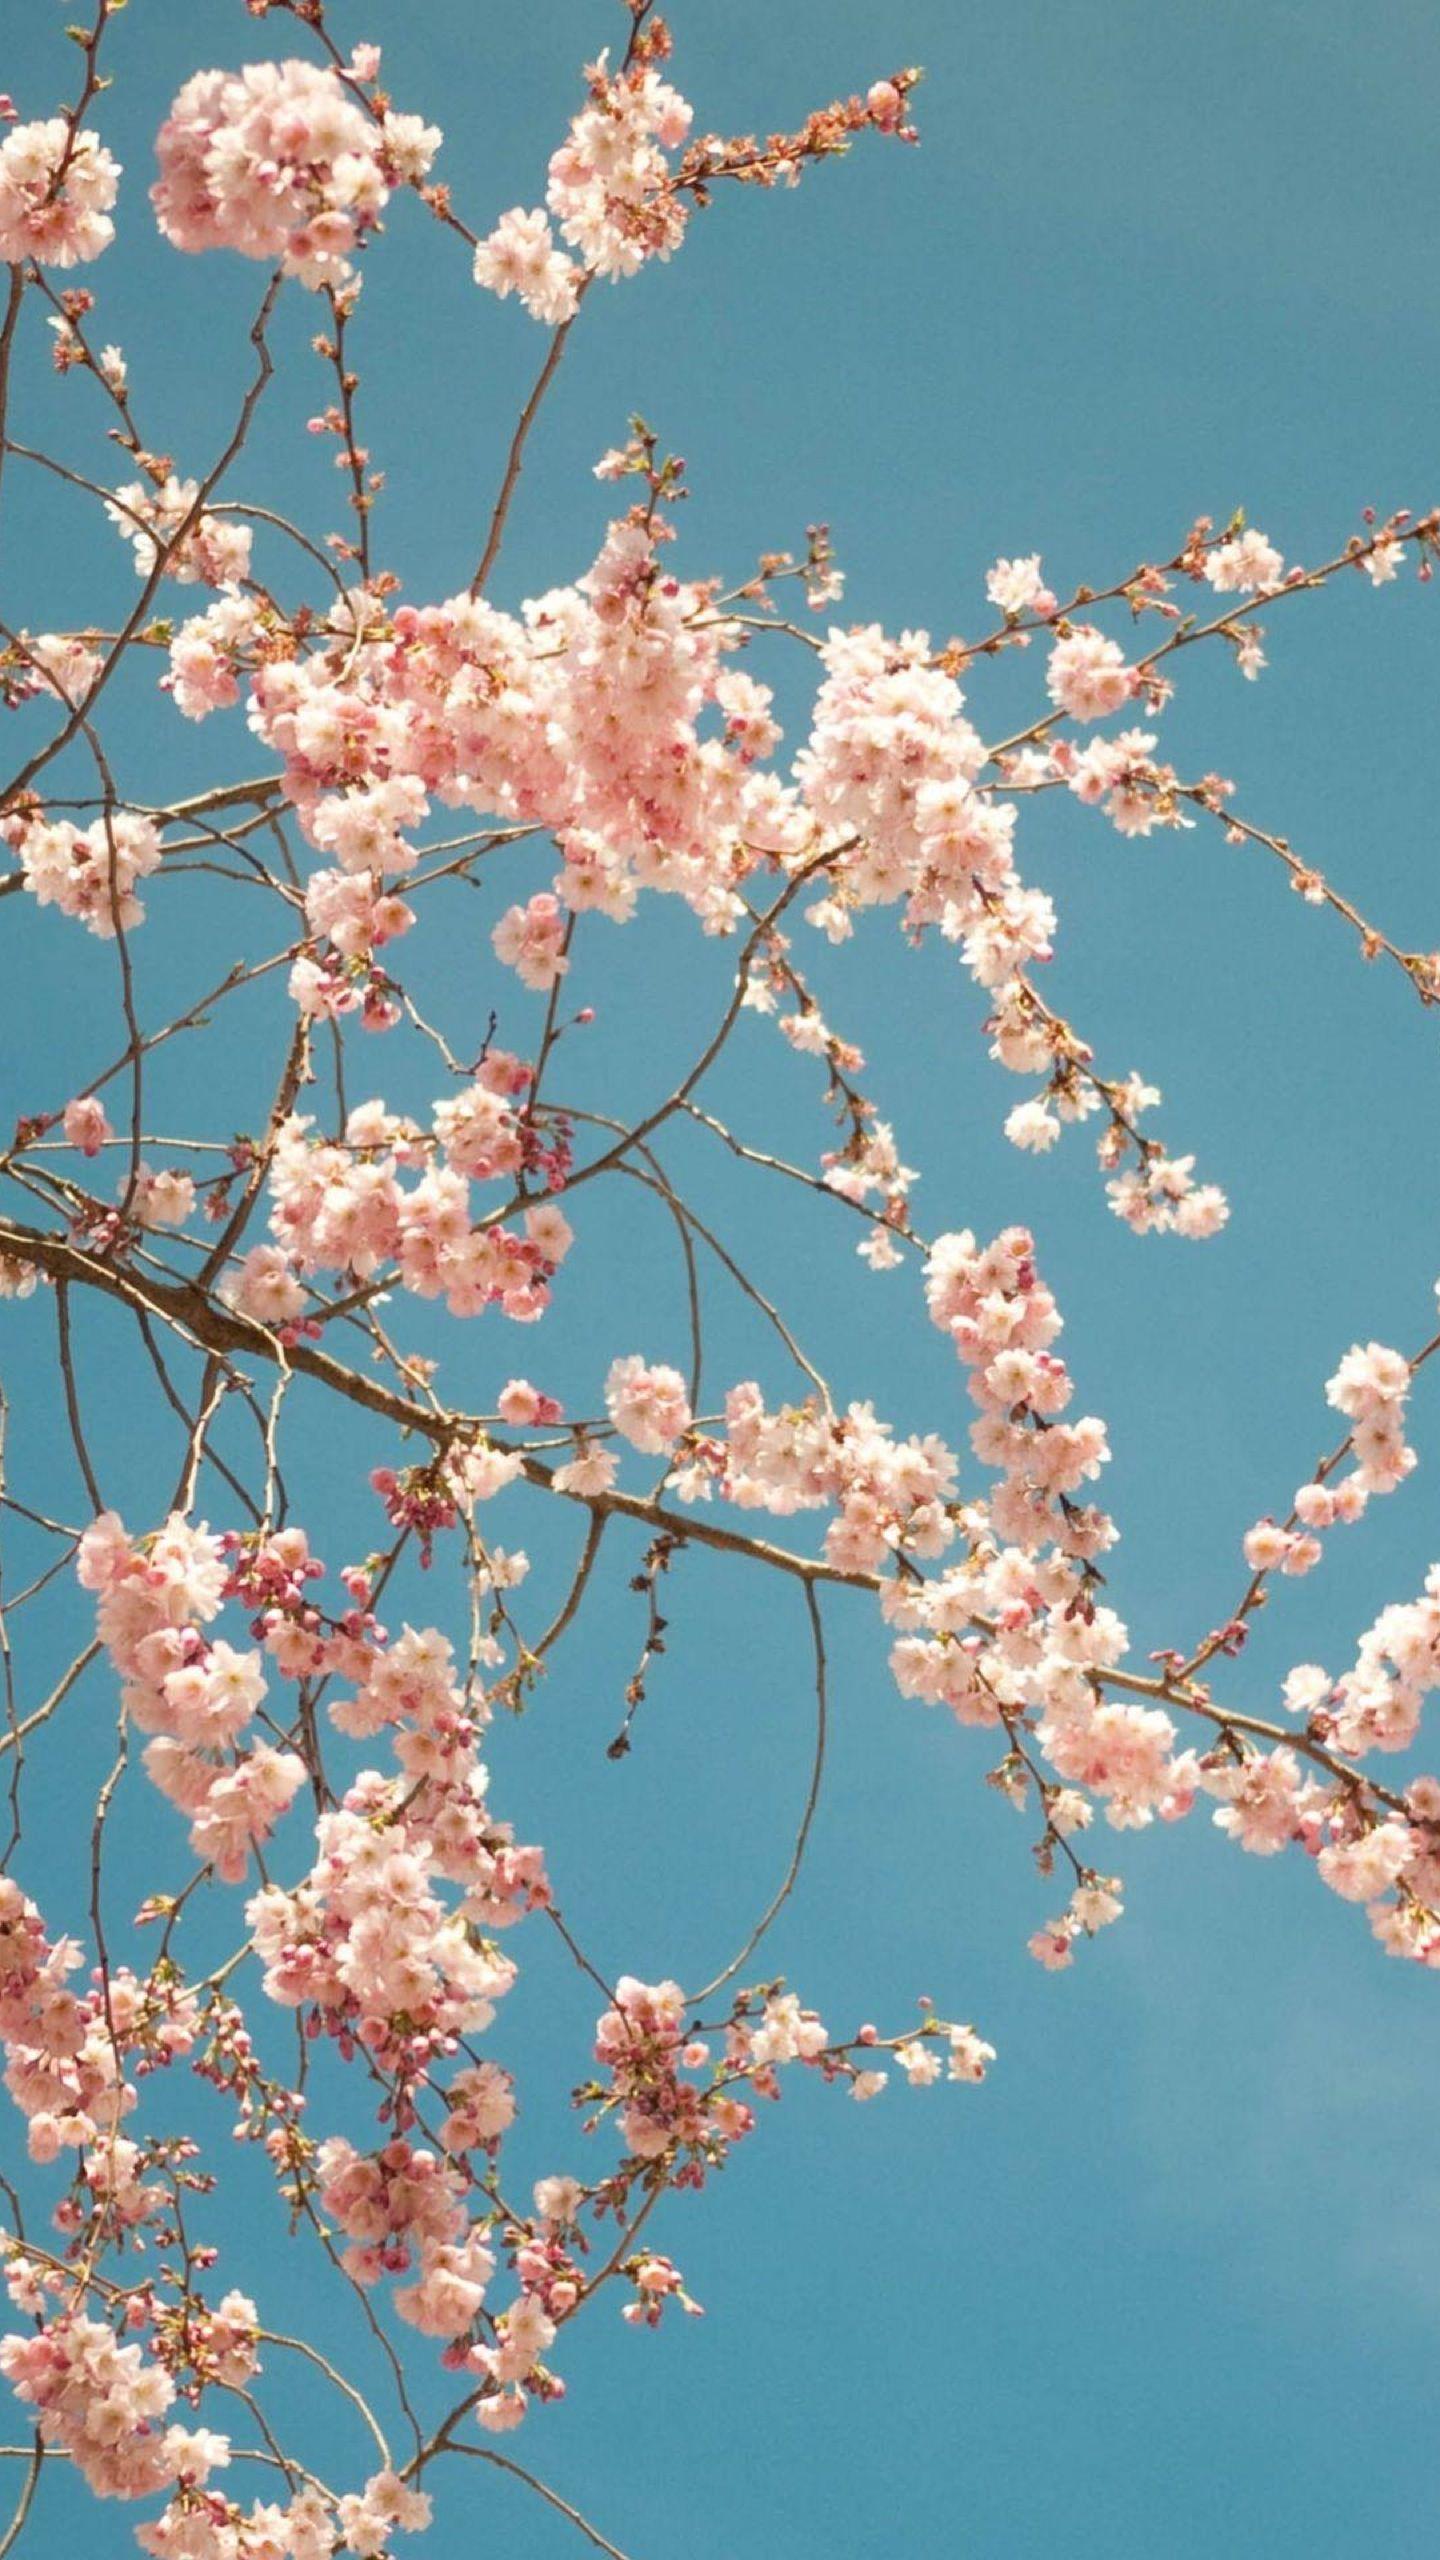 Unduh 99 Wallpaper Android Bunga Sakura Hd Terbaru Cherry Blossom Wallpaper Iphone Spring Wallpaper Hd Cool Wallpapers